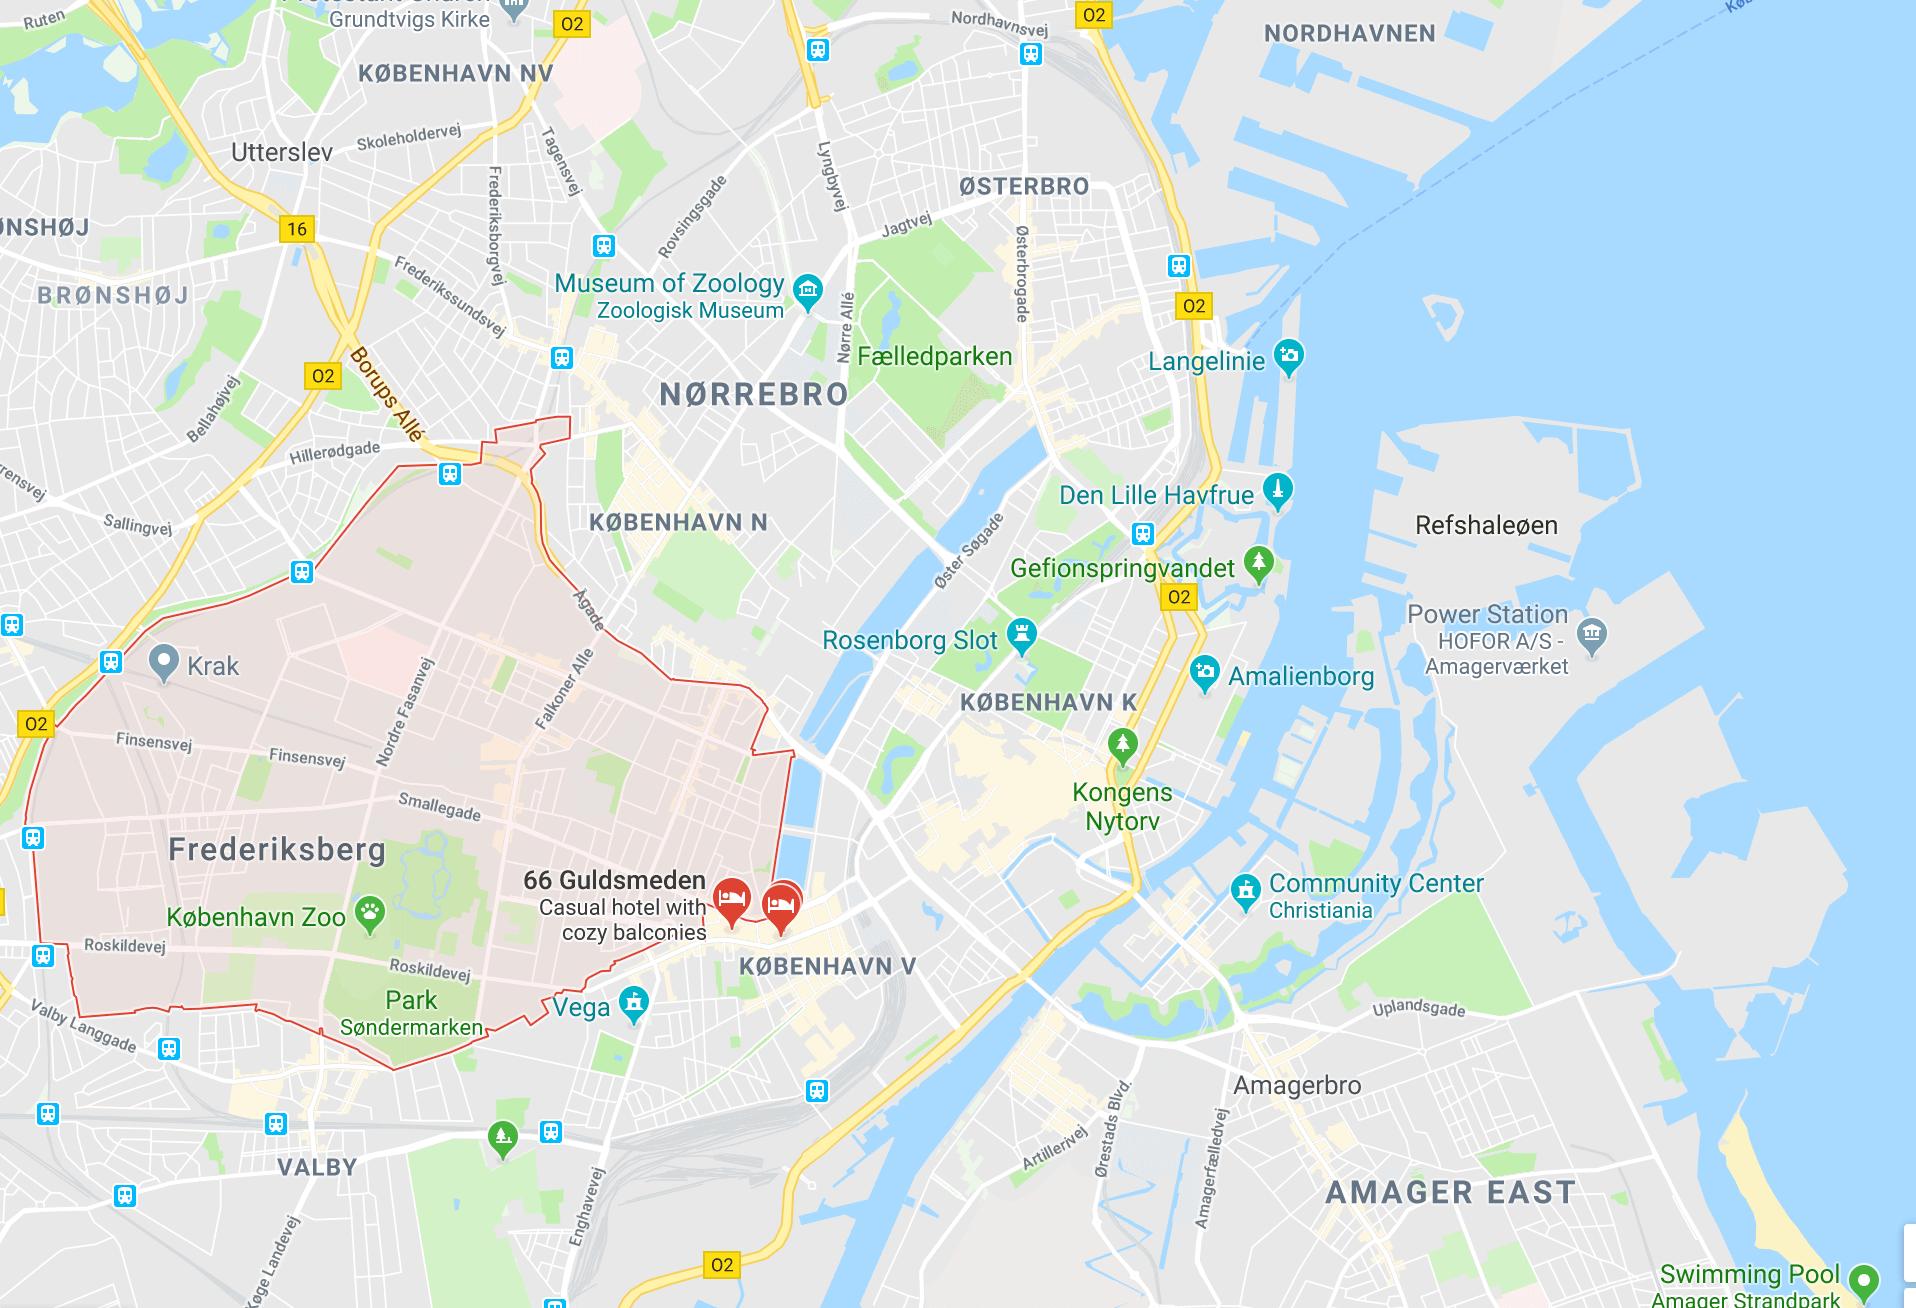 Frederiksberg, Comprehensive Guide to Copenhagen on a Budget